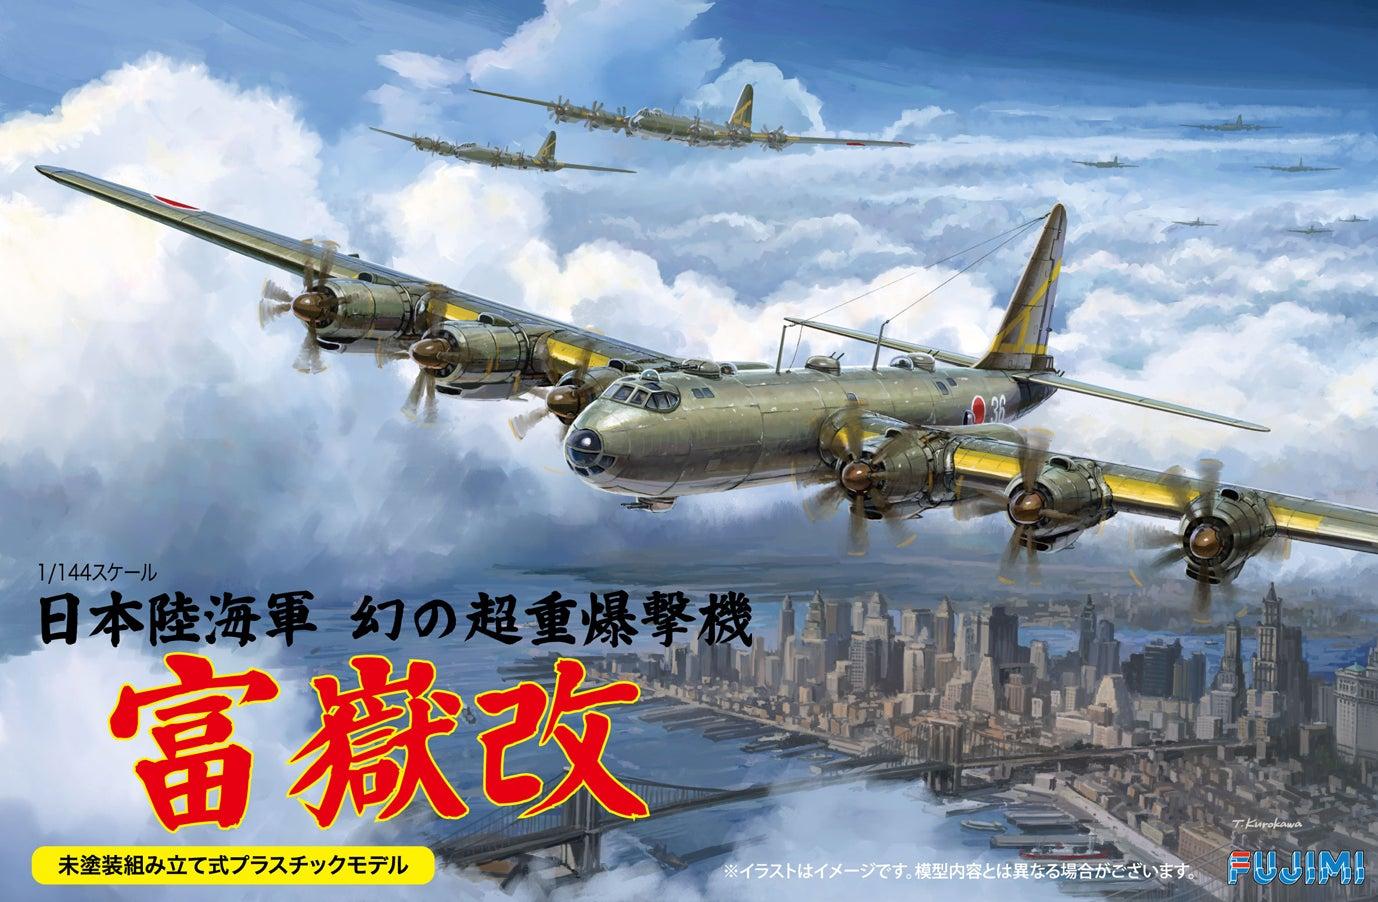 8 2017 Toyland Hobby Modeling Magazine Masker Polar 6 In 1 Premium Quality 144 14417 Japan Army And Sea Visionary Super Heavy Bomber Futakari Kai